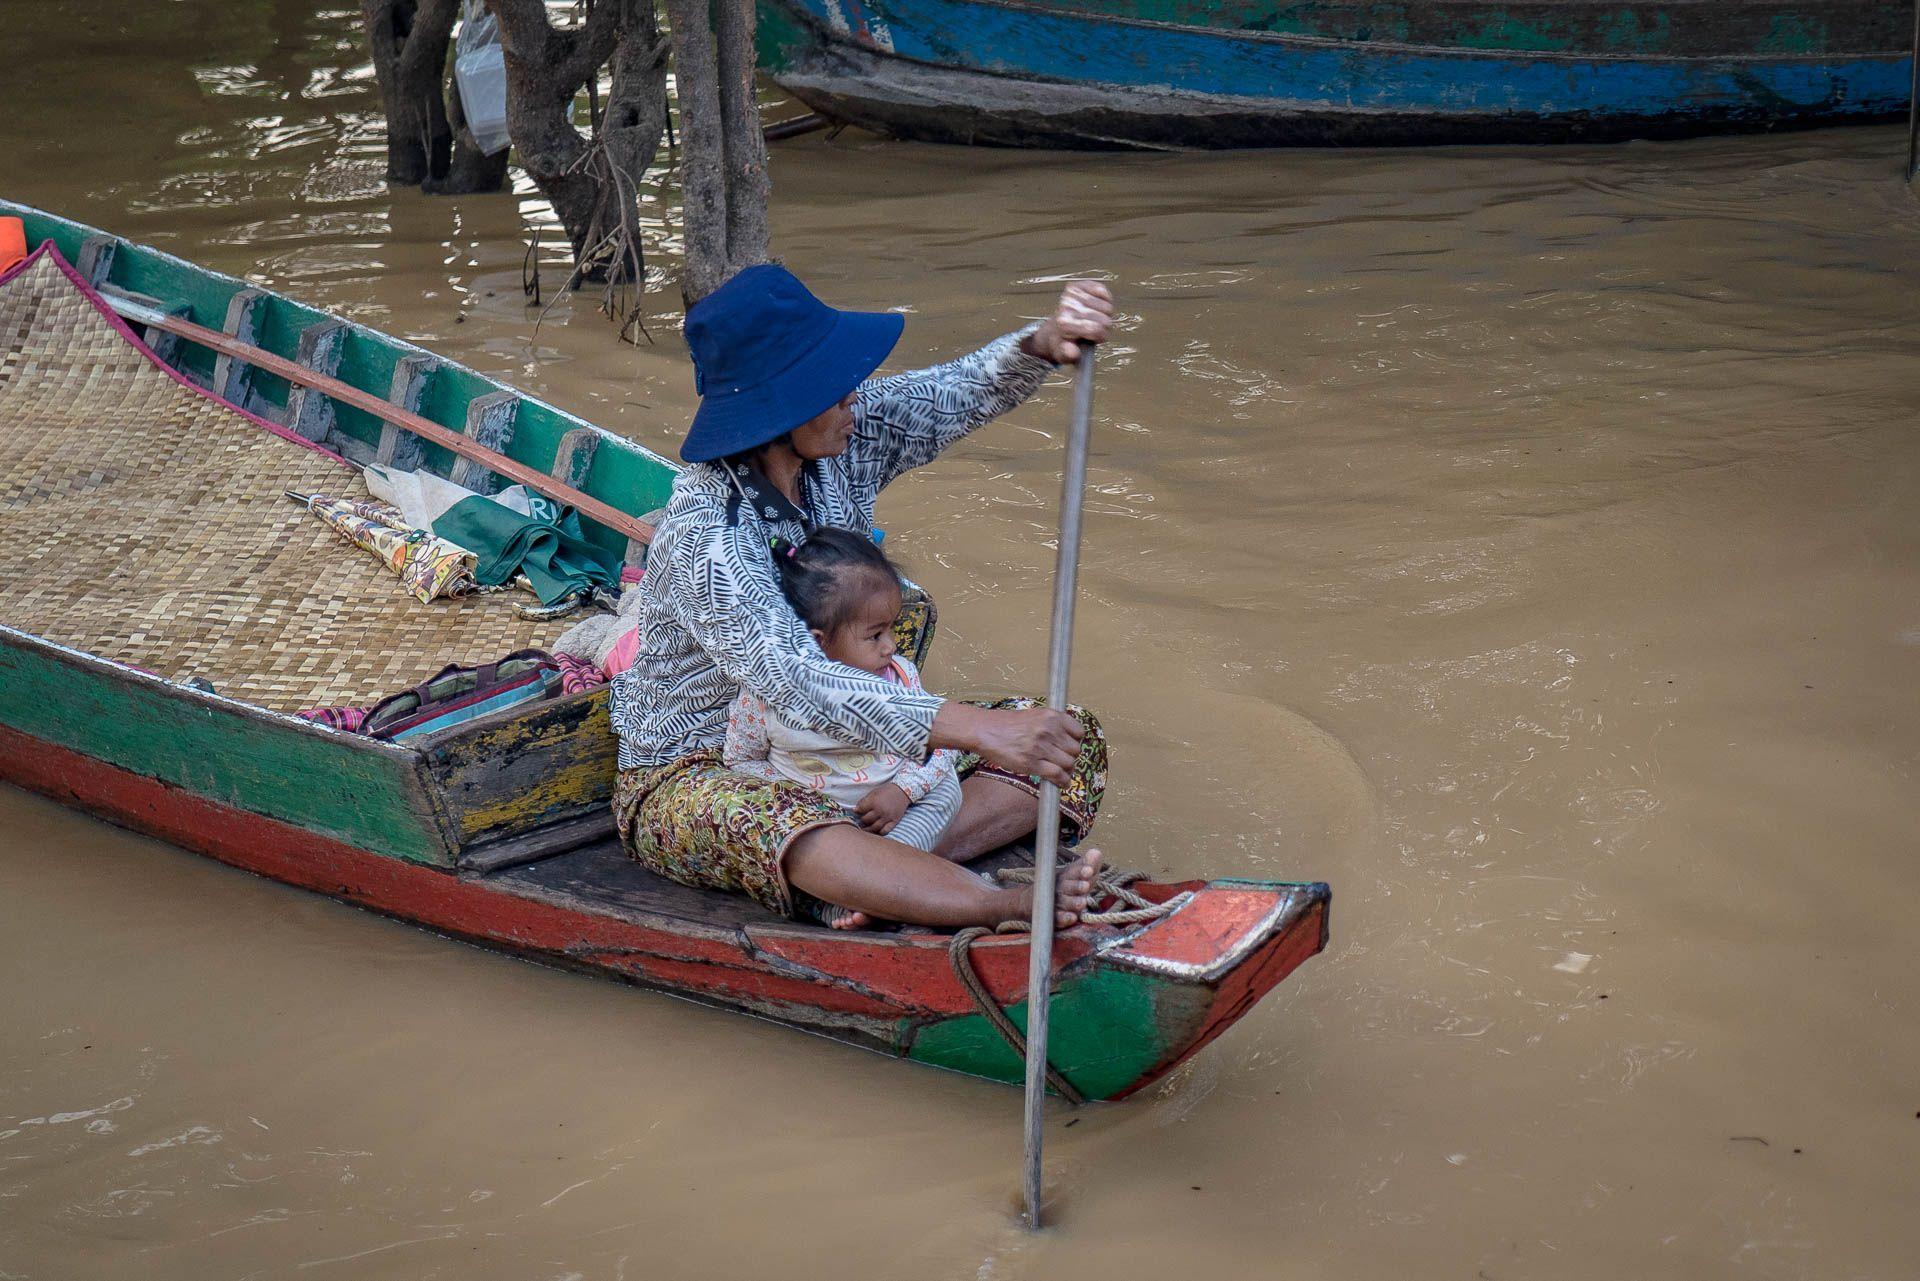 Lesvoyageuses-guide-voyage-siem-reap-angkor-cambodge-lavender-jeep-14